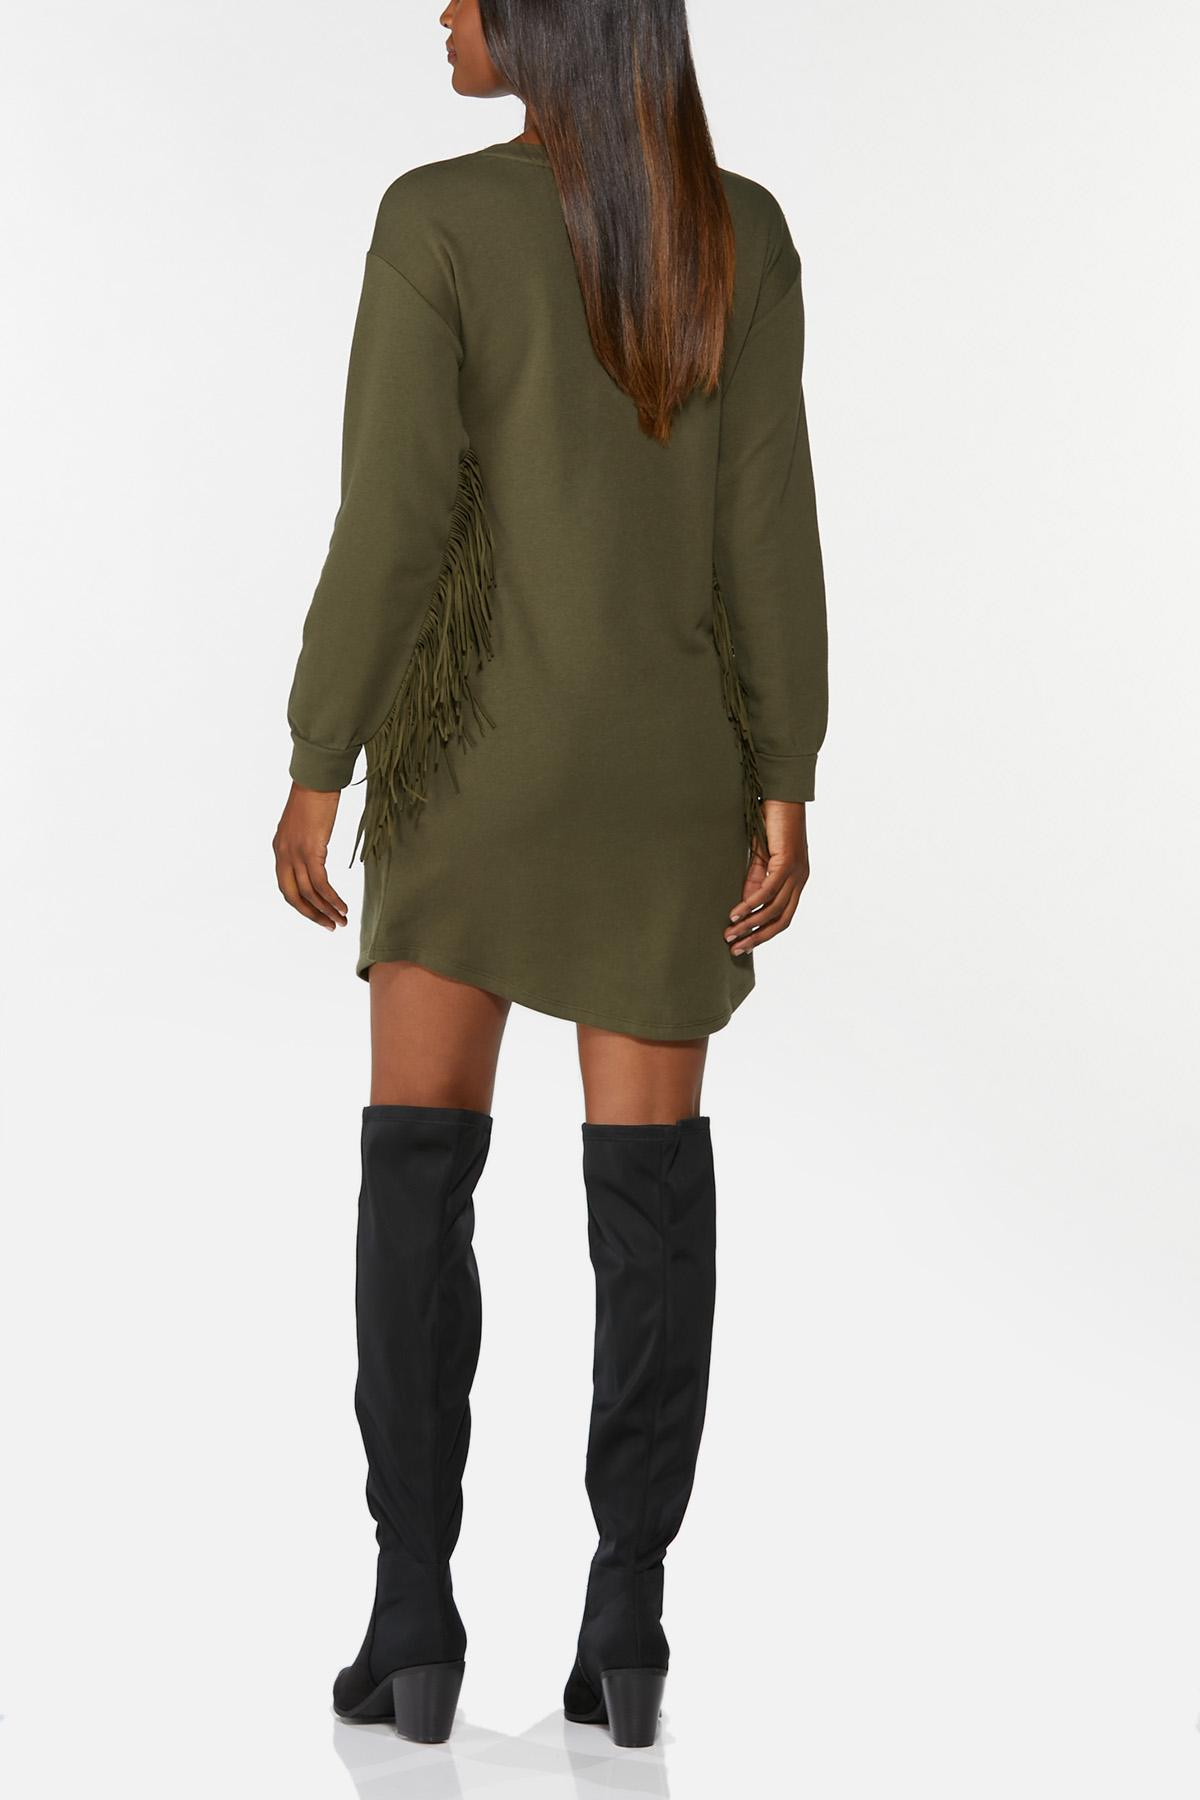 Fringe Trim Shift Dress (Item #44772060)